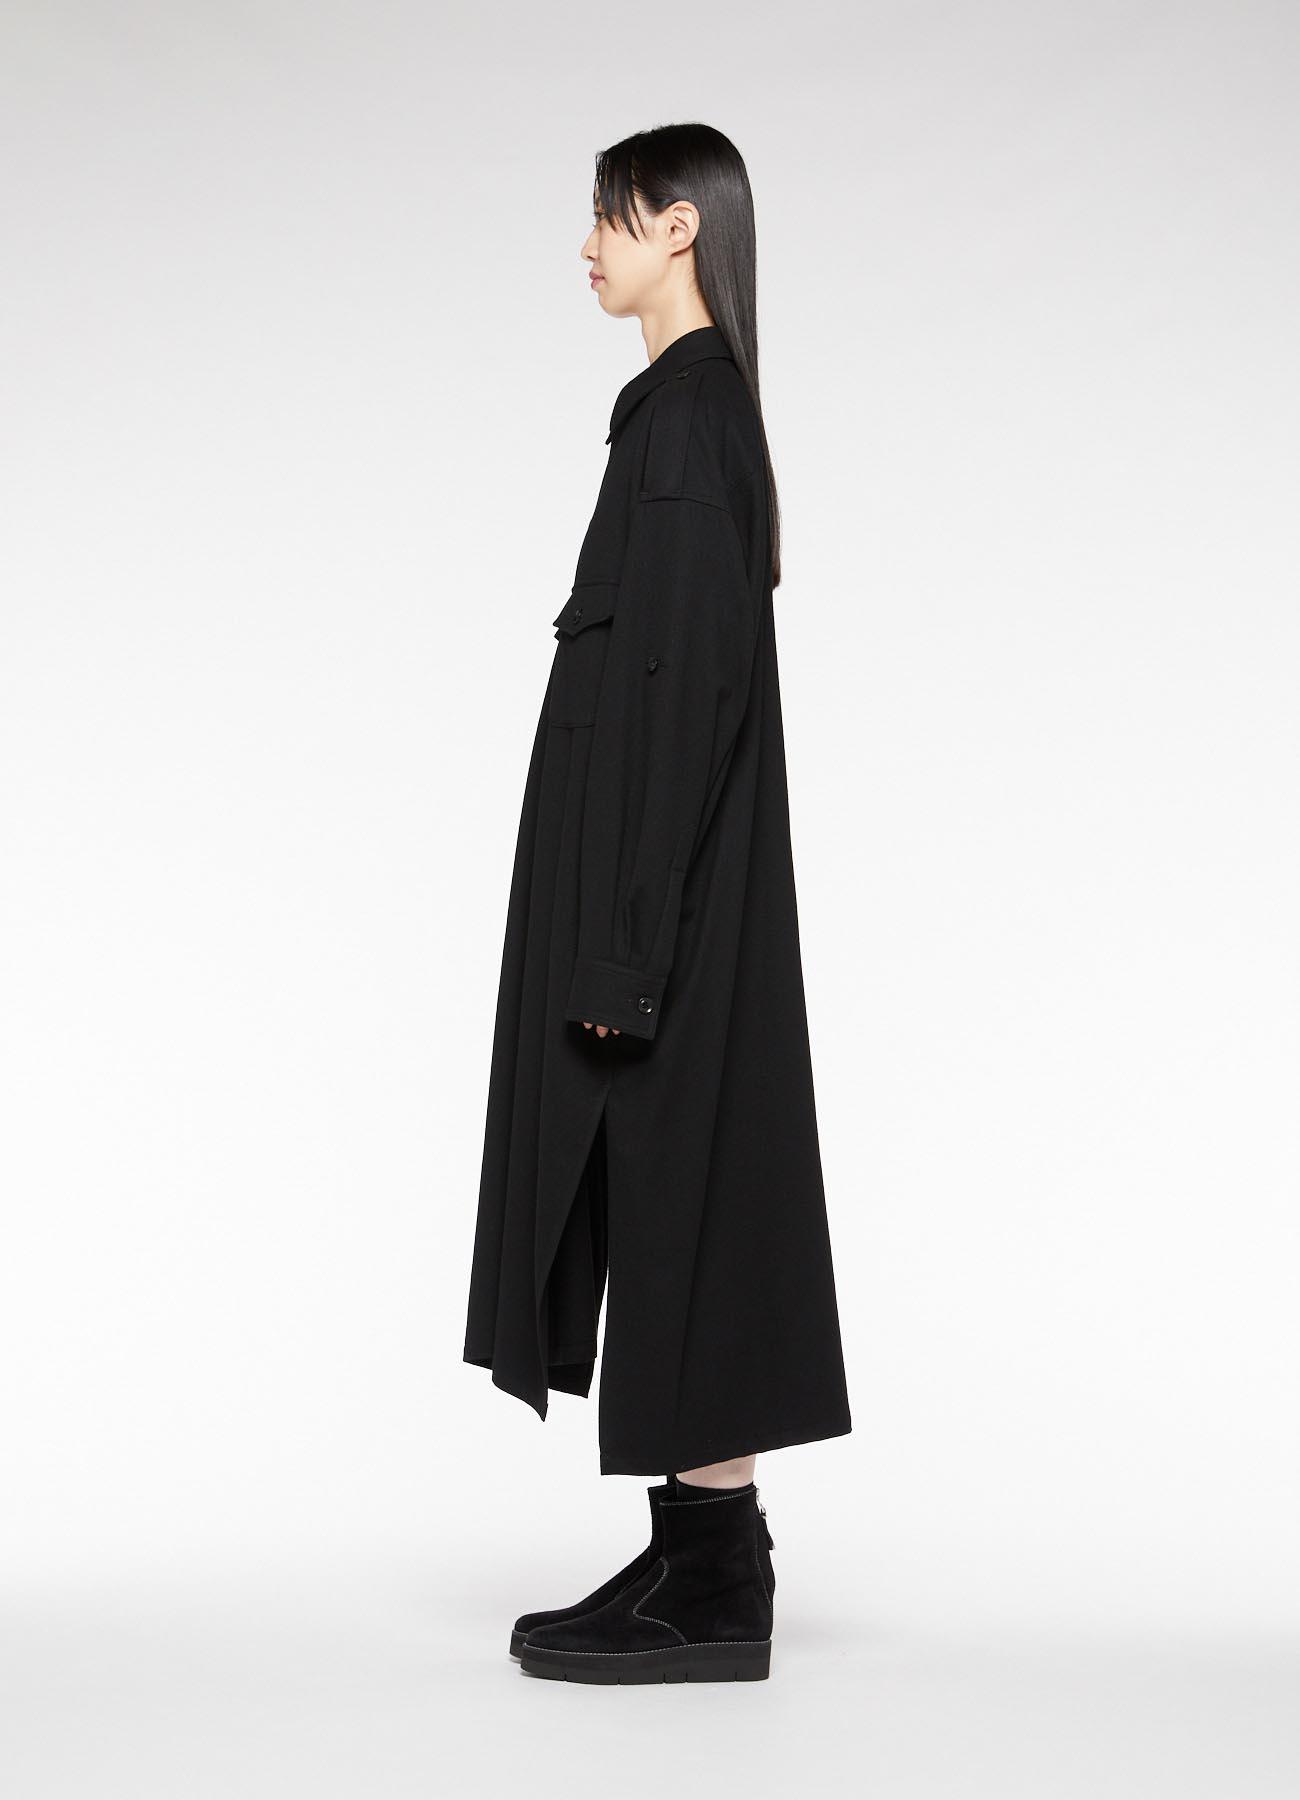 2/72 SP100'S FLANNEL 2 CHEST POCKET SHIRT DRESS